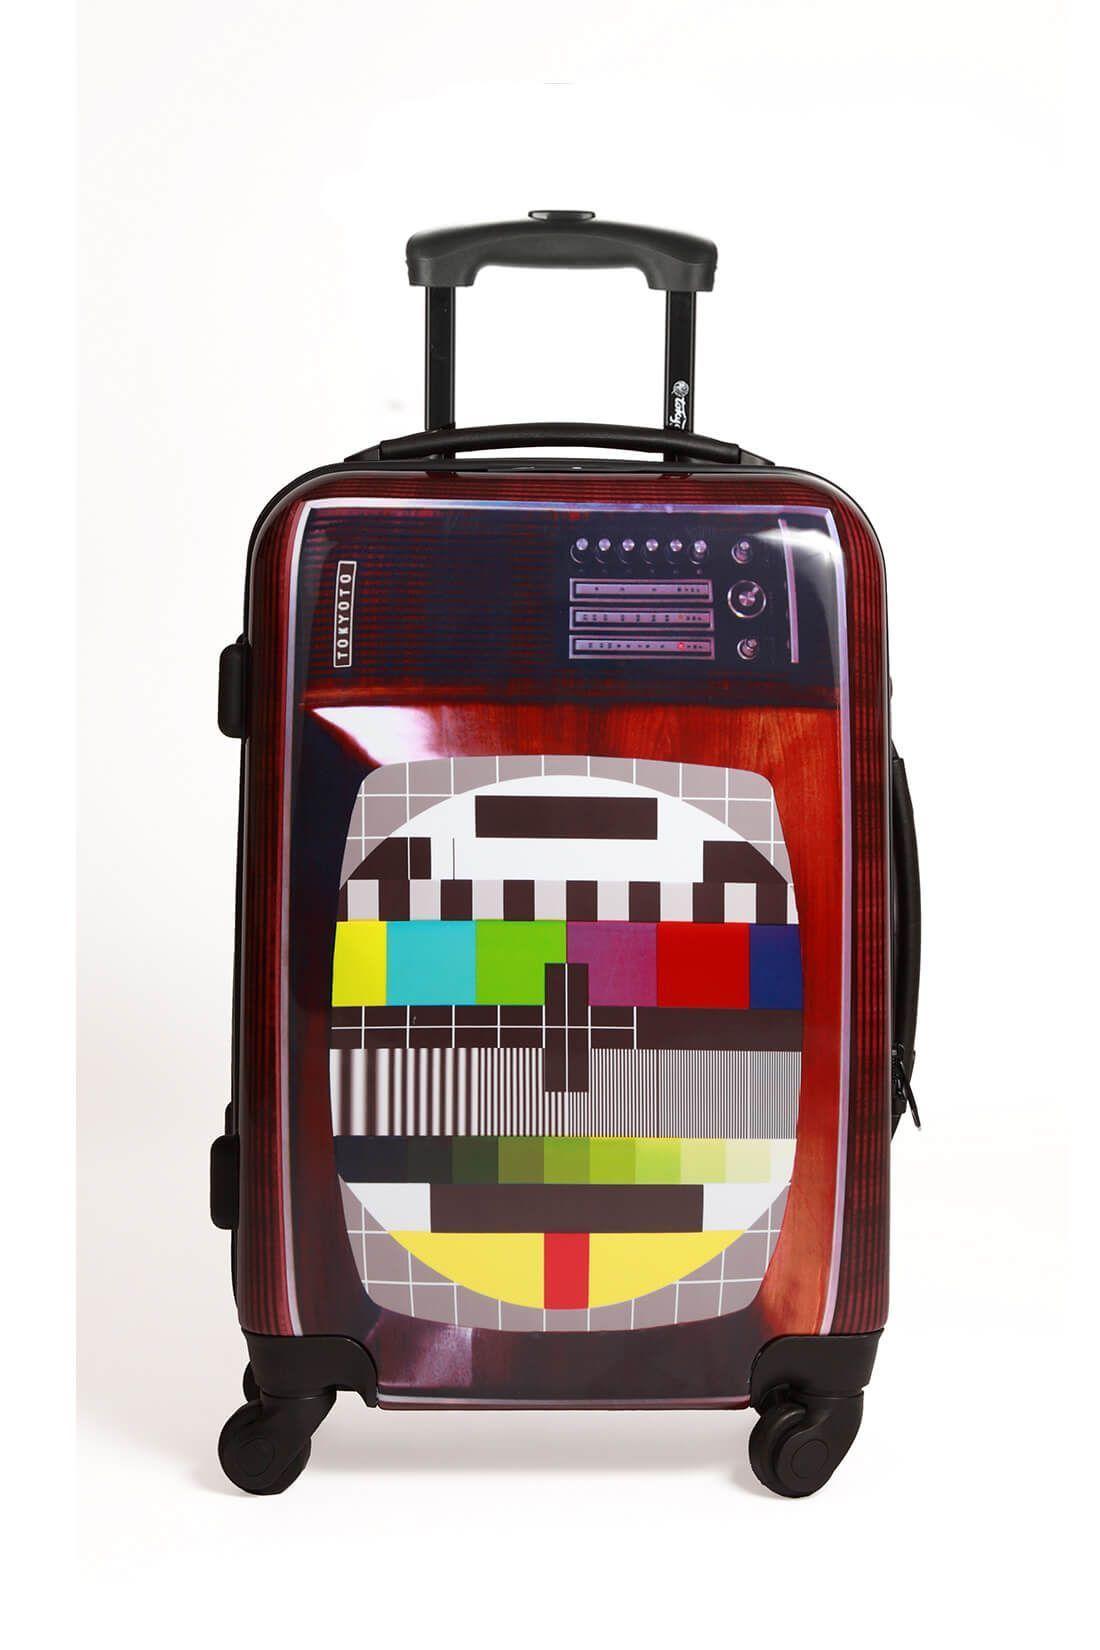 valise tv